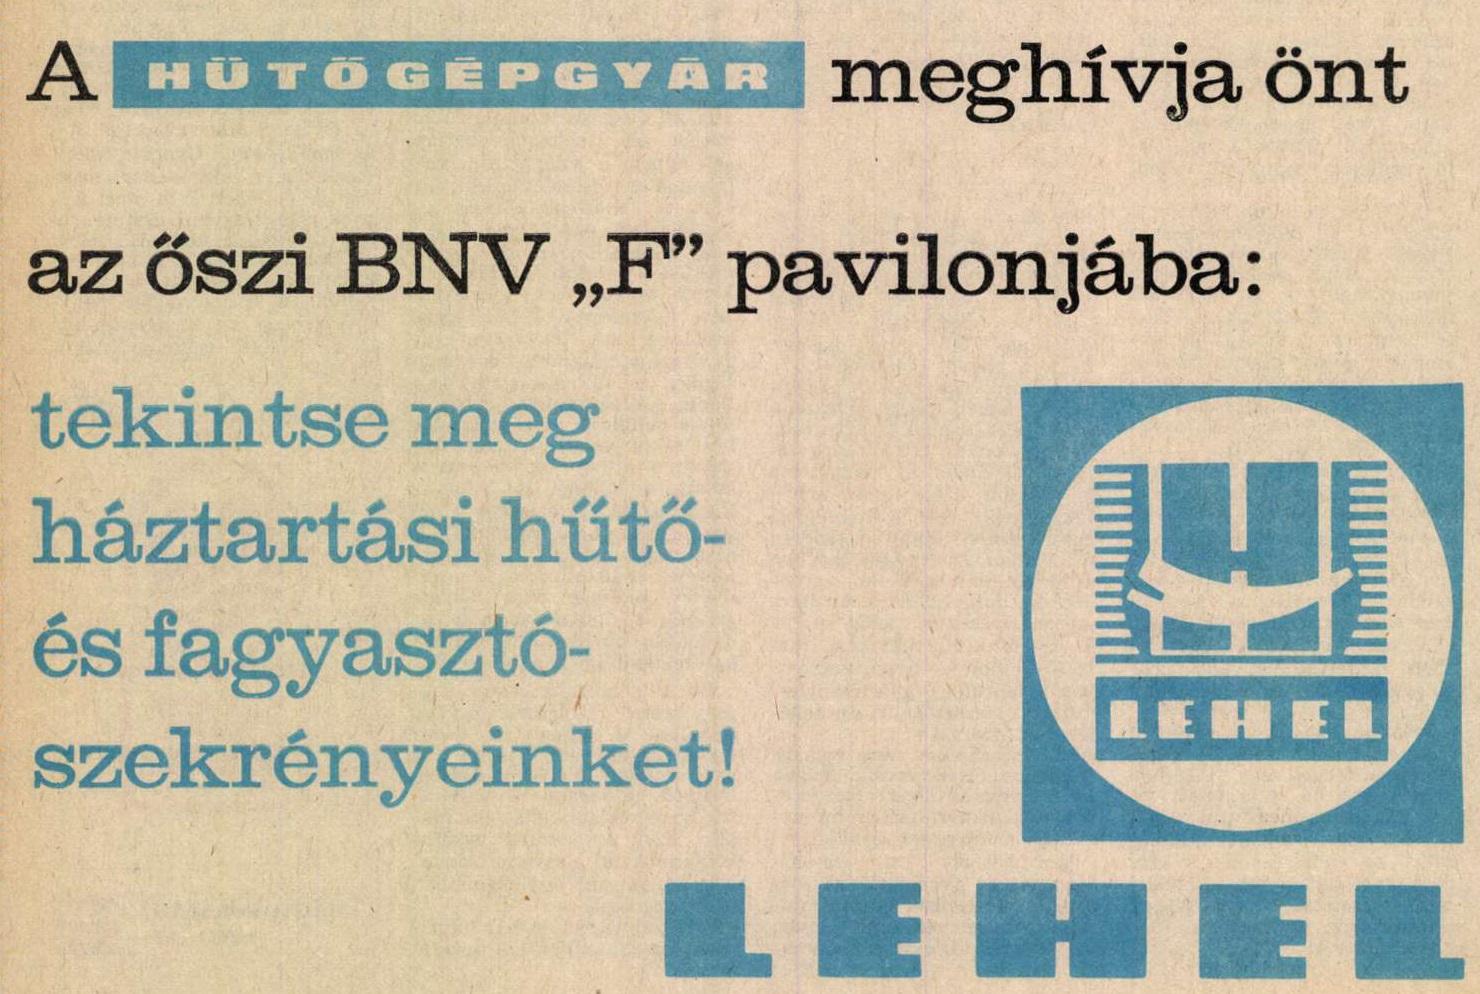 idokapszula_nb_i_1983_84_5_fordulo_reklam_3.jpg